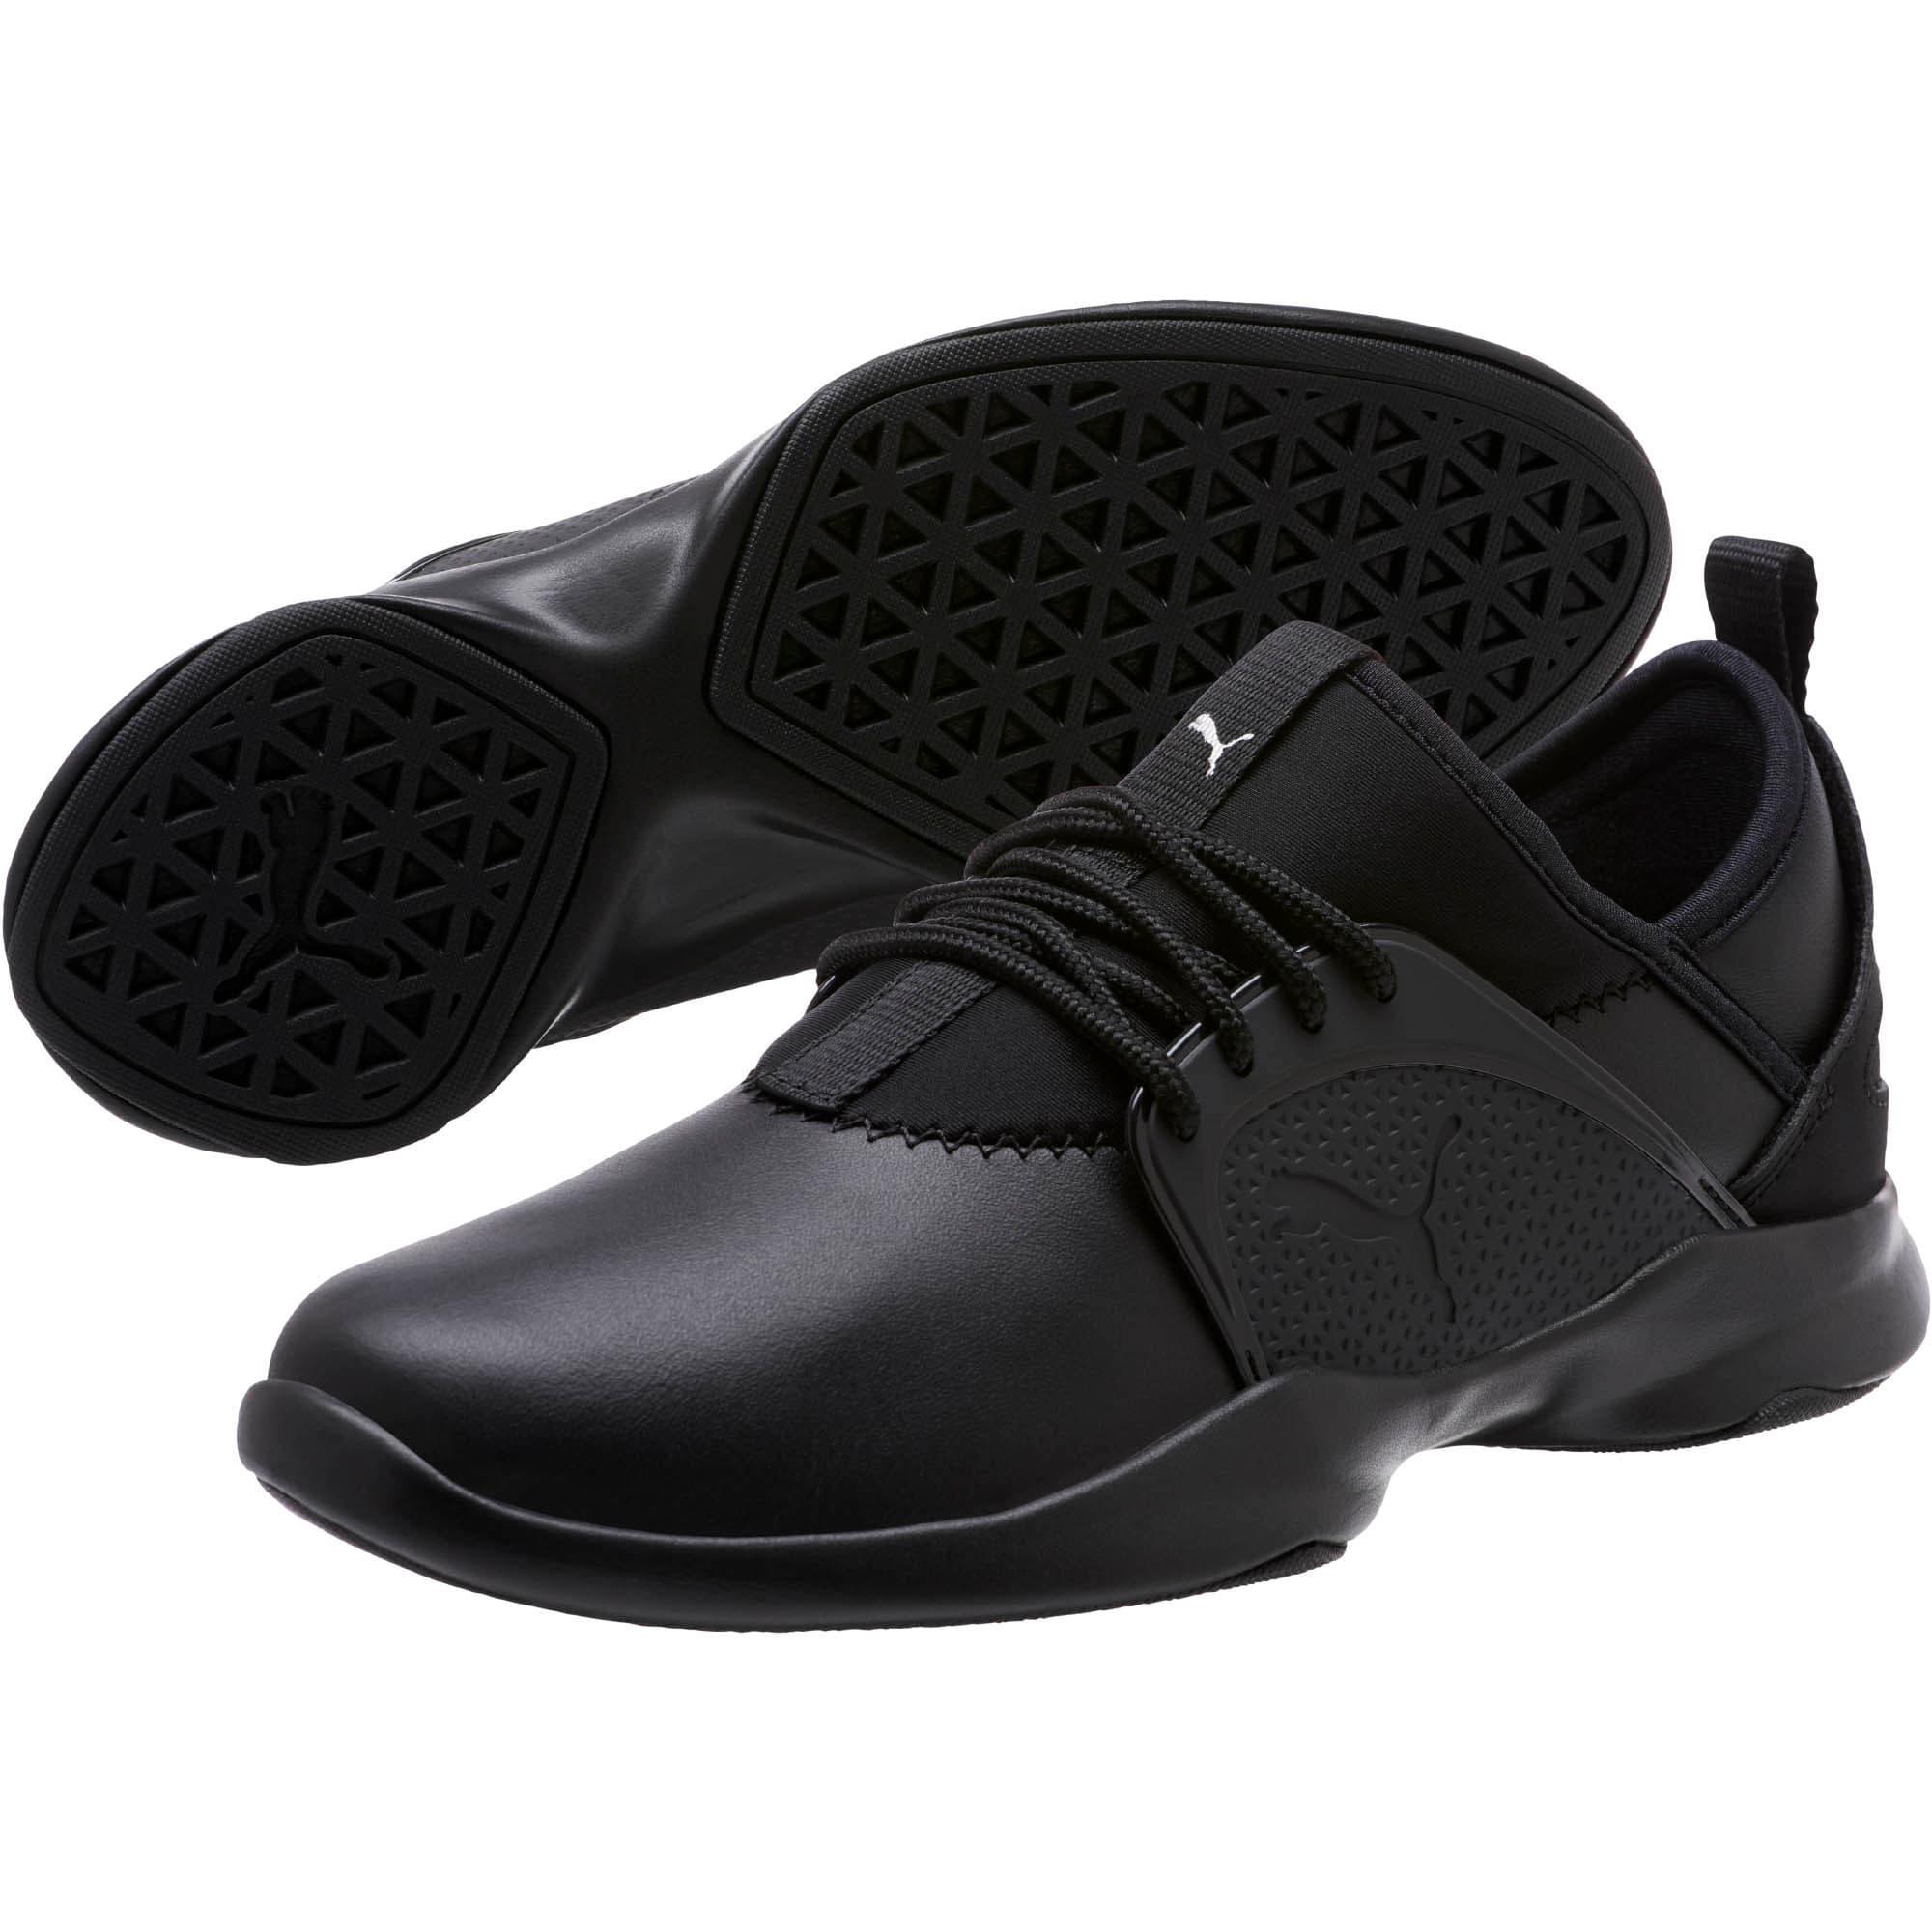 Thumbnail 2 of PUMA Dare Lace Women's Sneakers, P.Black-P.Black-P. Black, medium